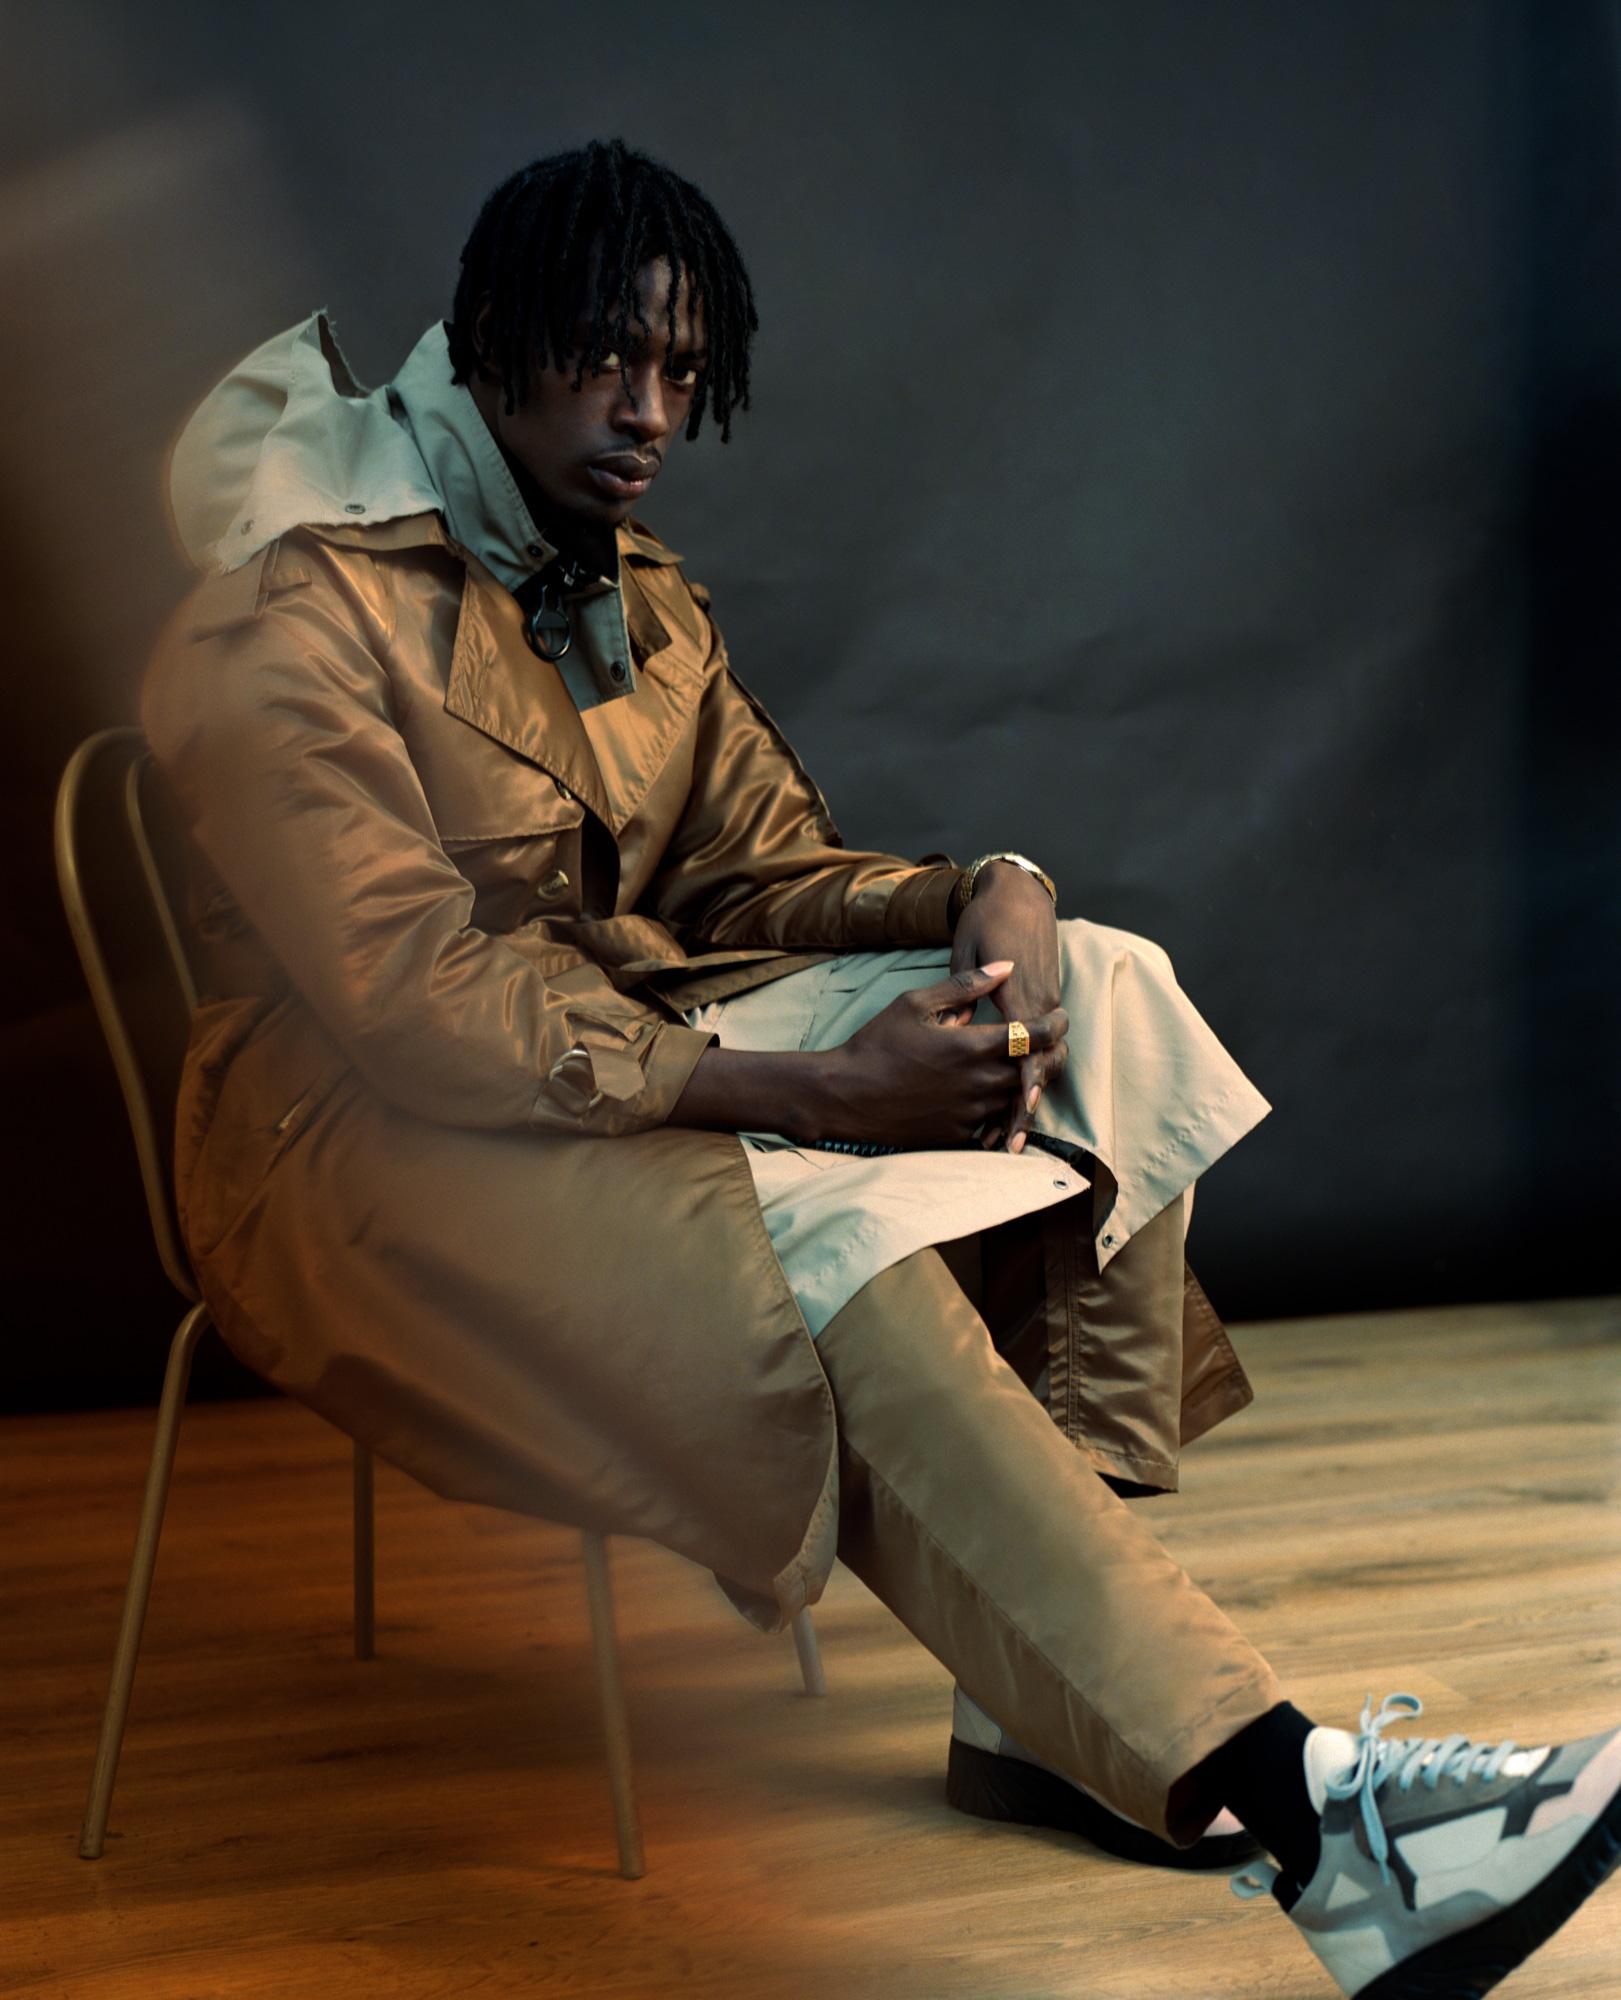 Mista Silva, Afrobeats Artist, fashion editorial for Notion Magazine, Photography by Ioannis Koussertari.